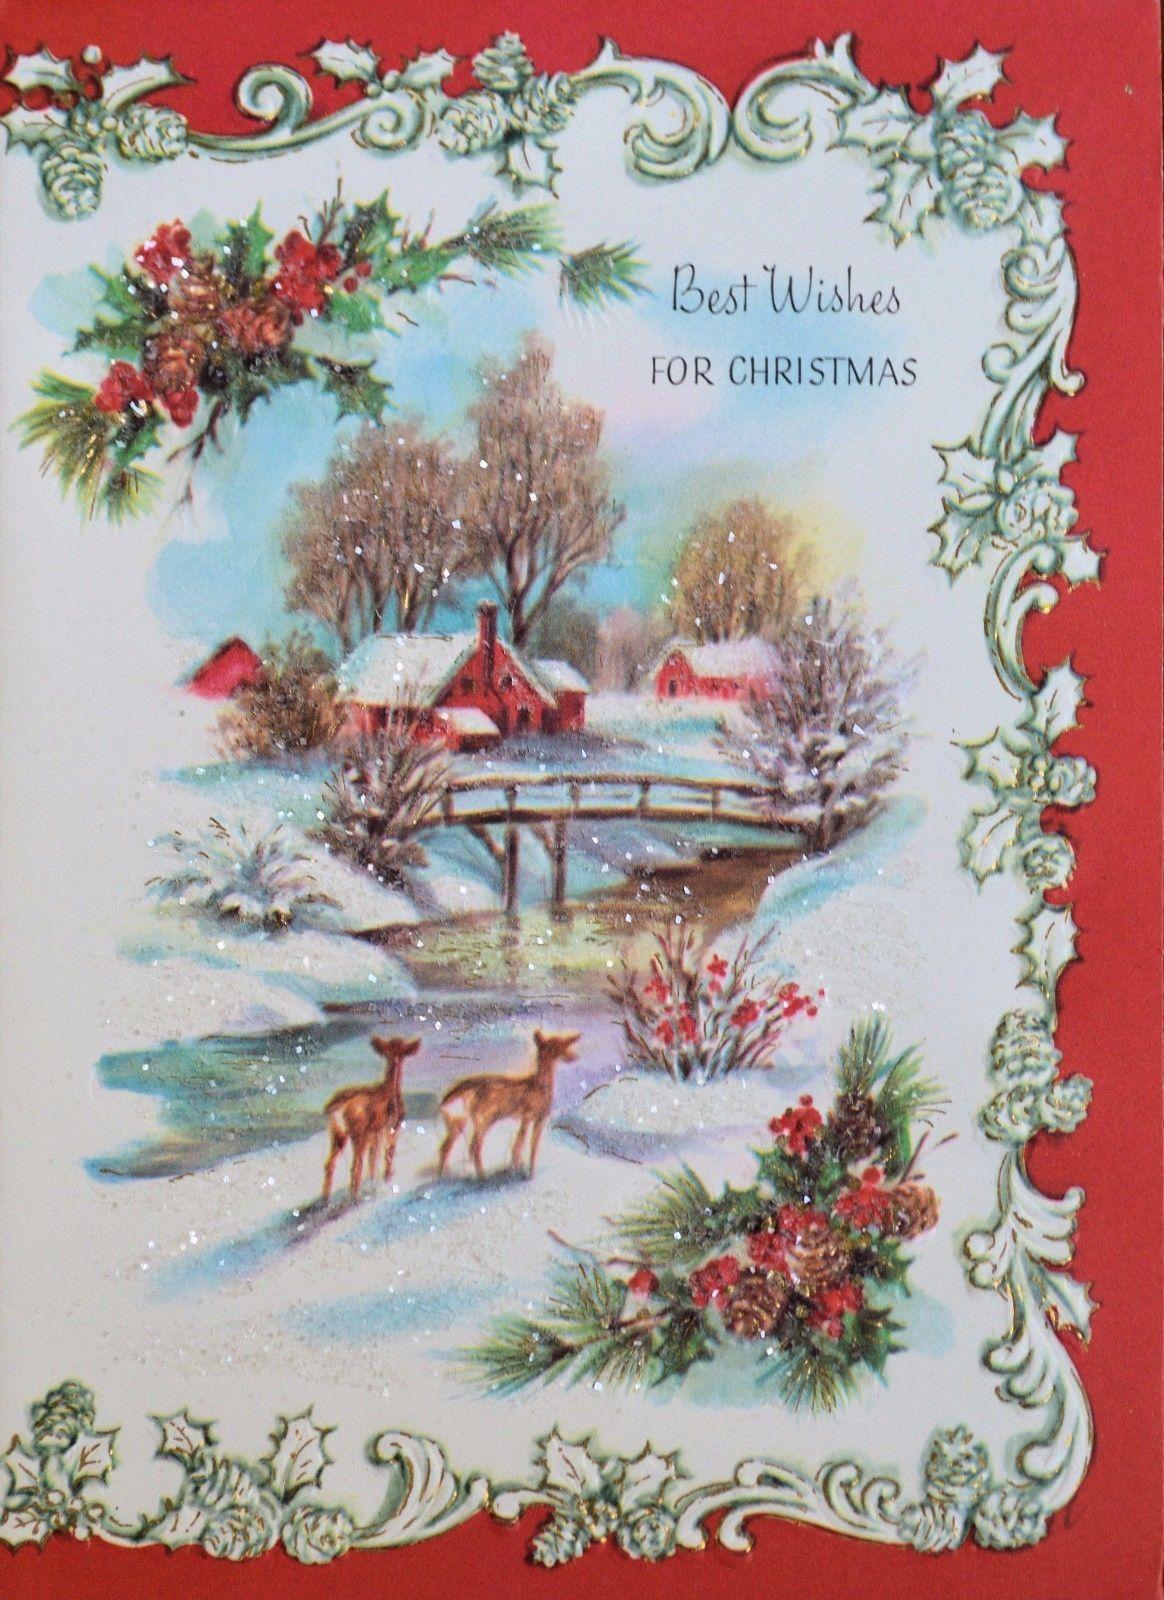 Pin by Wanda Etheridge on christmas cards | Pinterest | Christmas ...